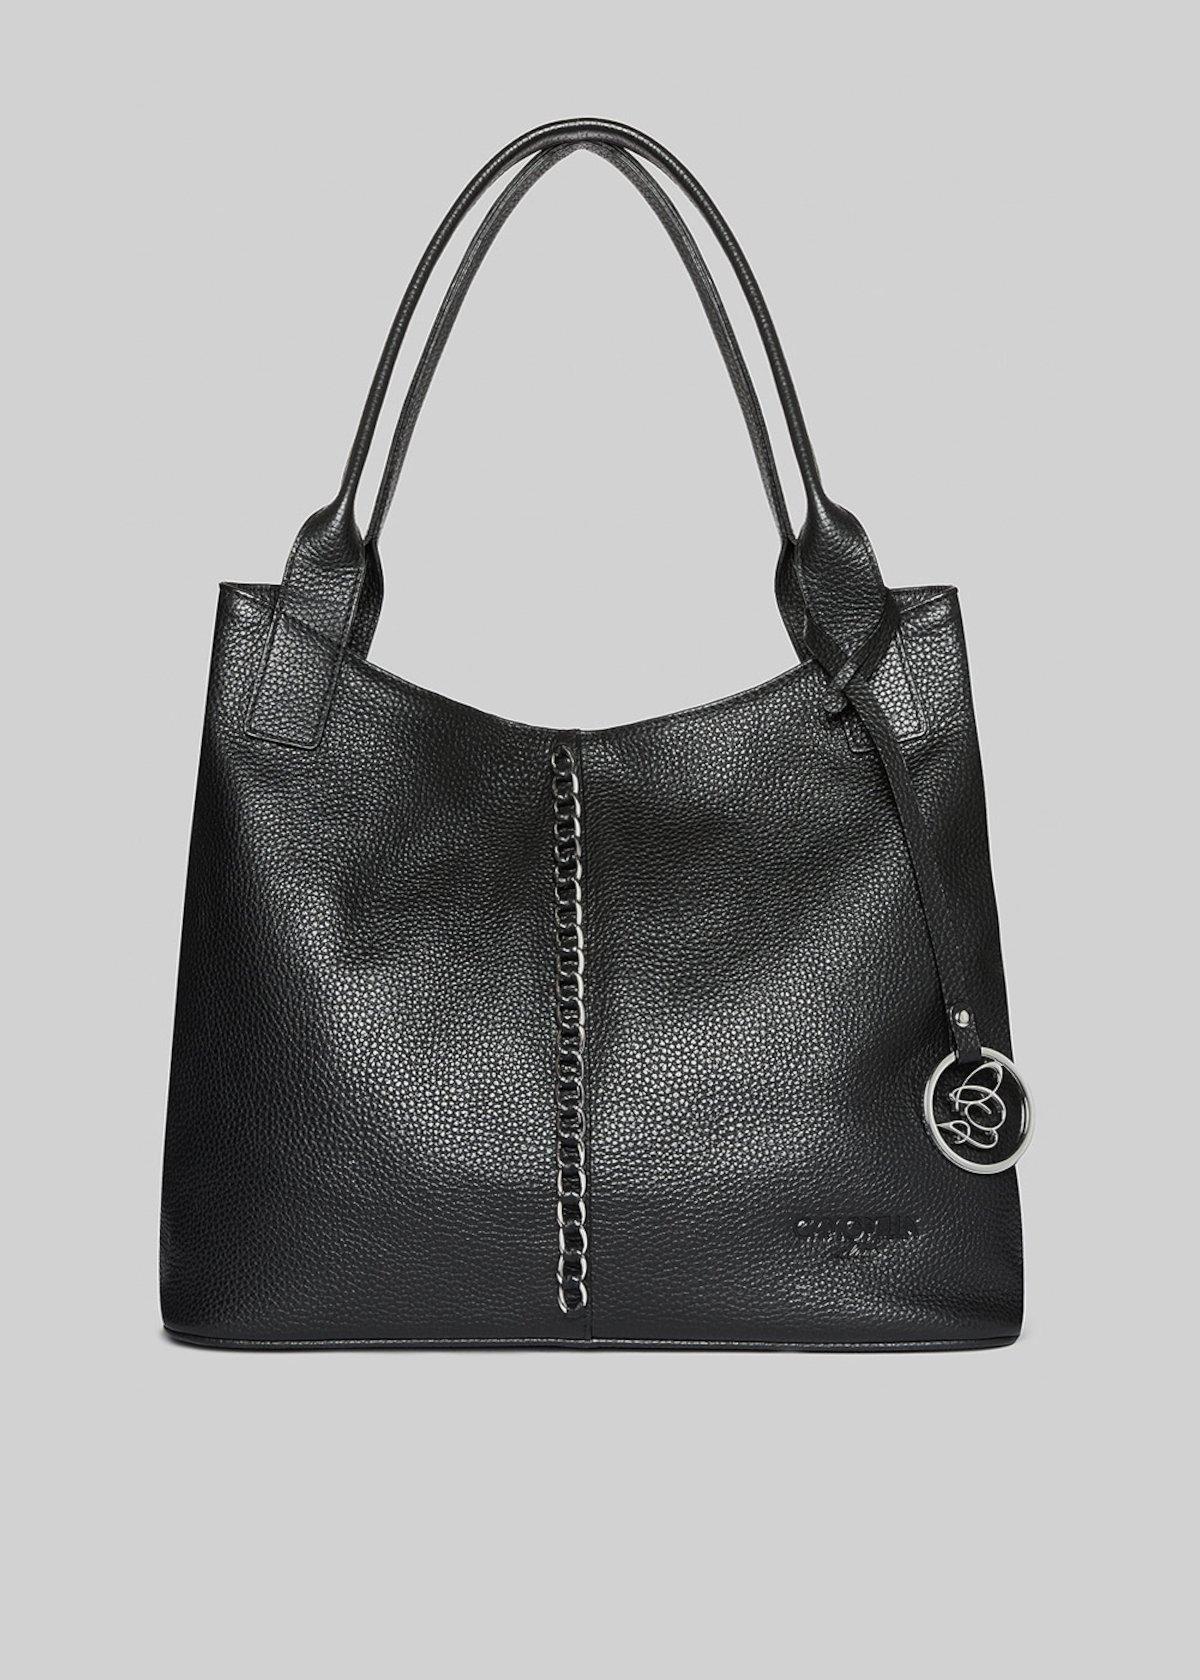 Borsa Bertilla in vera pelle con logo metal pendente - Black - Donna -  Immagine categoria 5df897ac71a